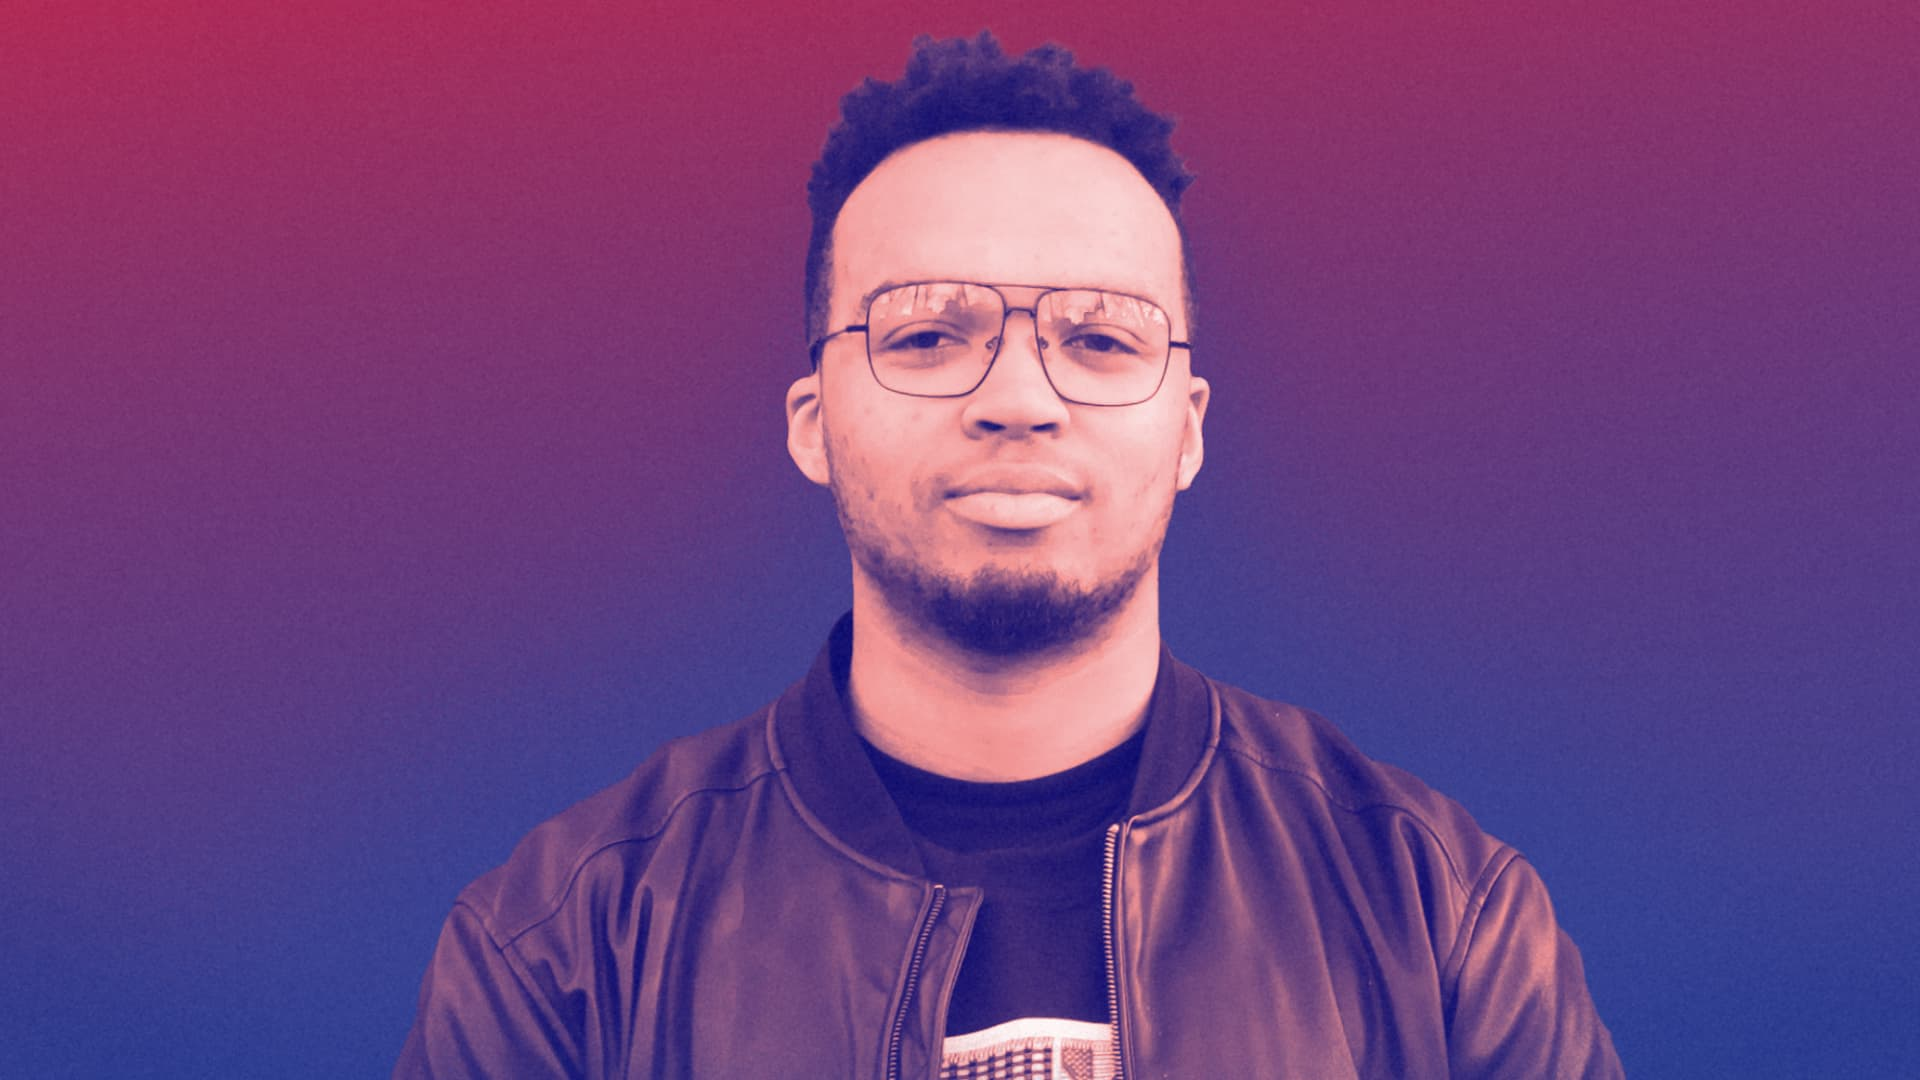 Nicholas Johnson, Princeton's first Black valedictorian